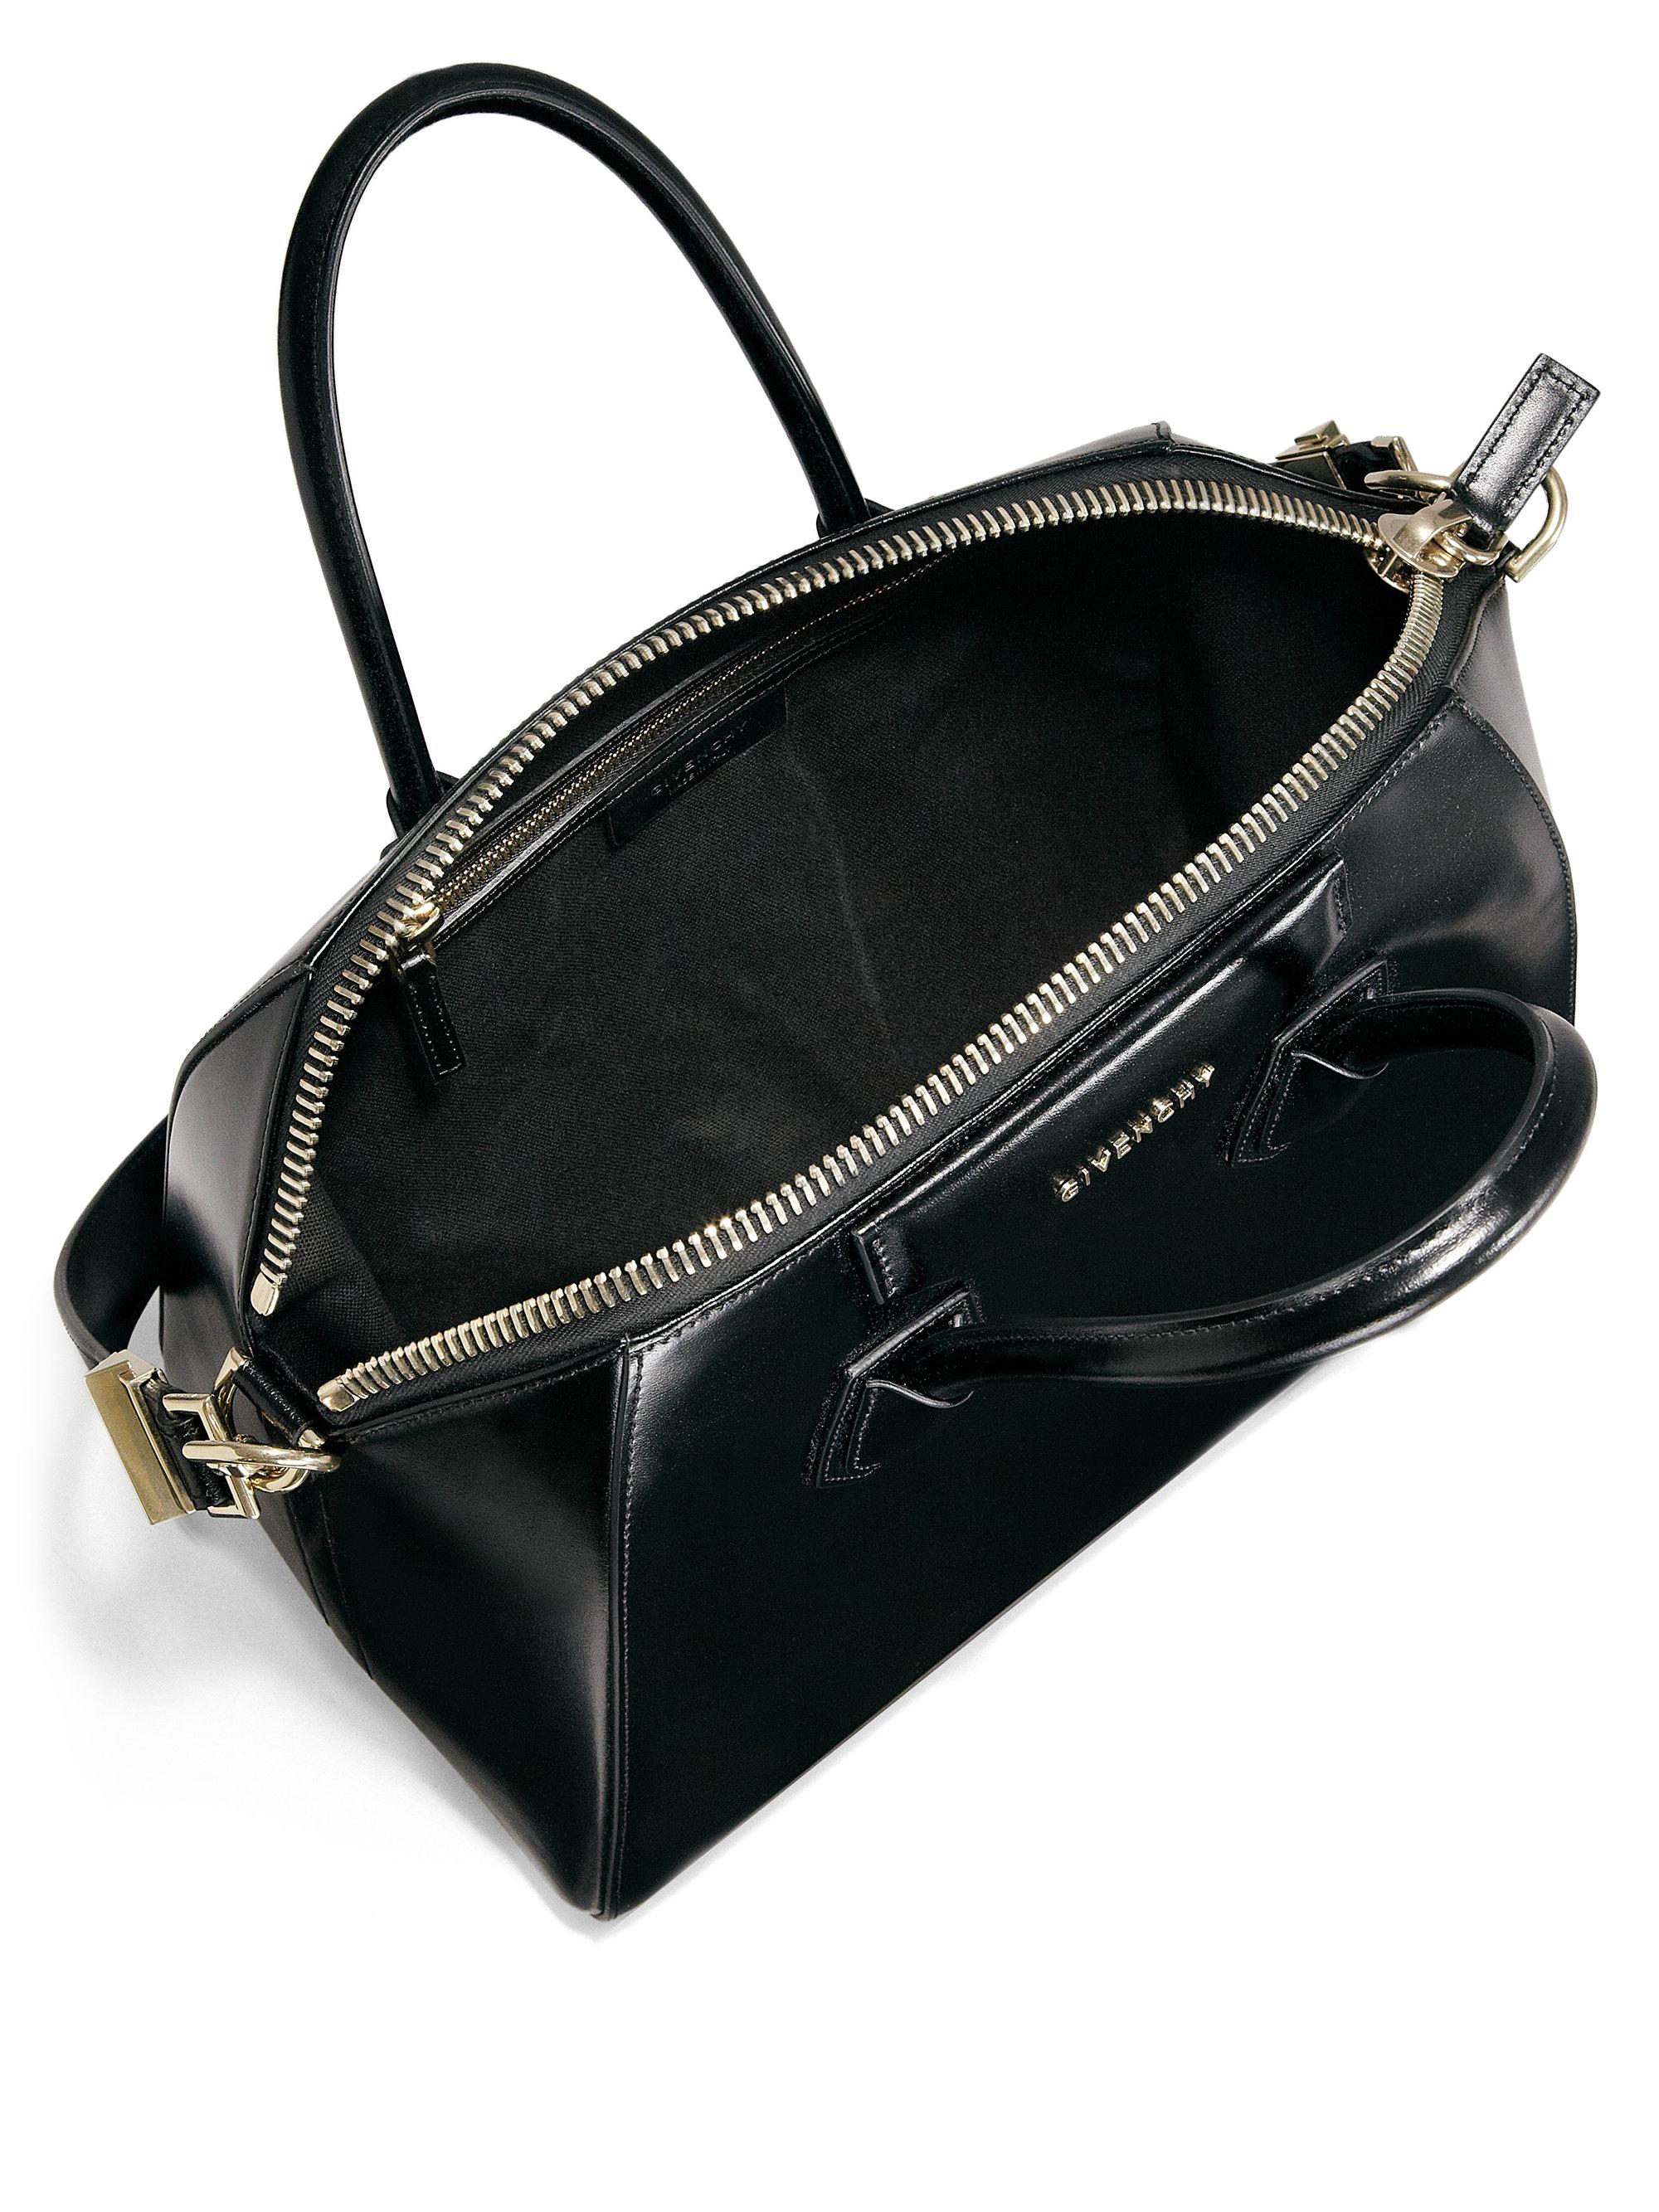 replica chloe purse - givenchy antigona small glazed black leather satchel, givenchy ...